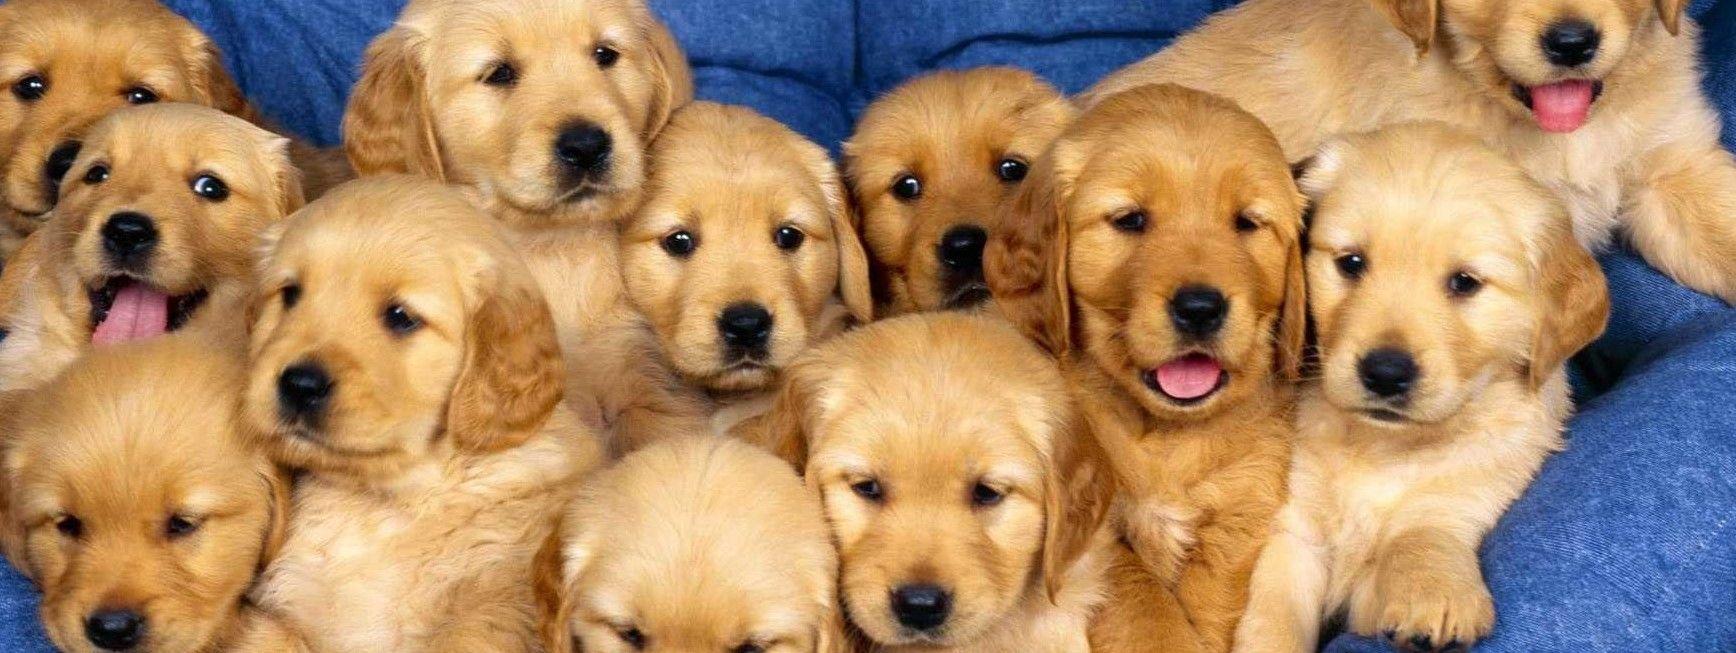 Dog food bargains dogs dog food recipes shih tzu